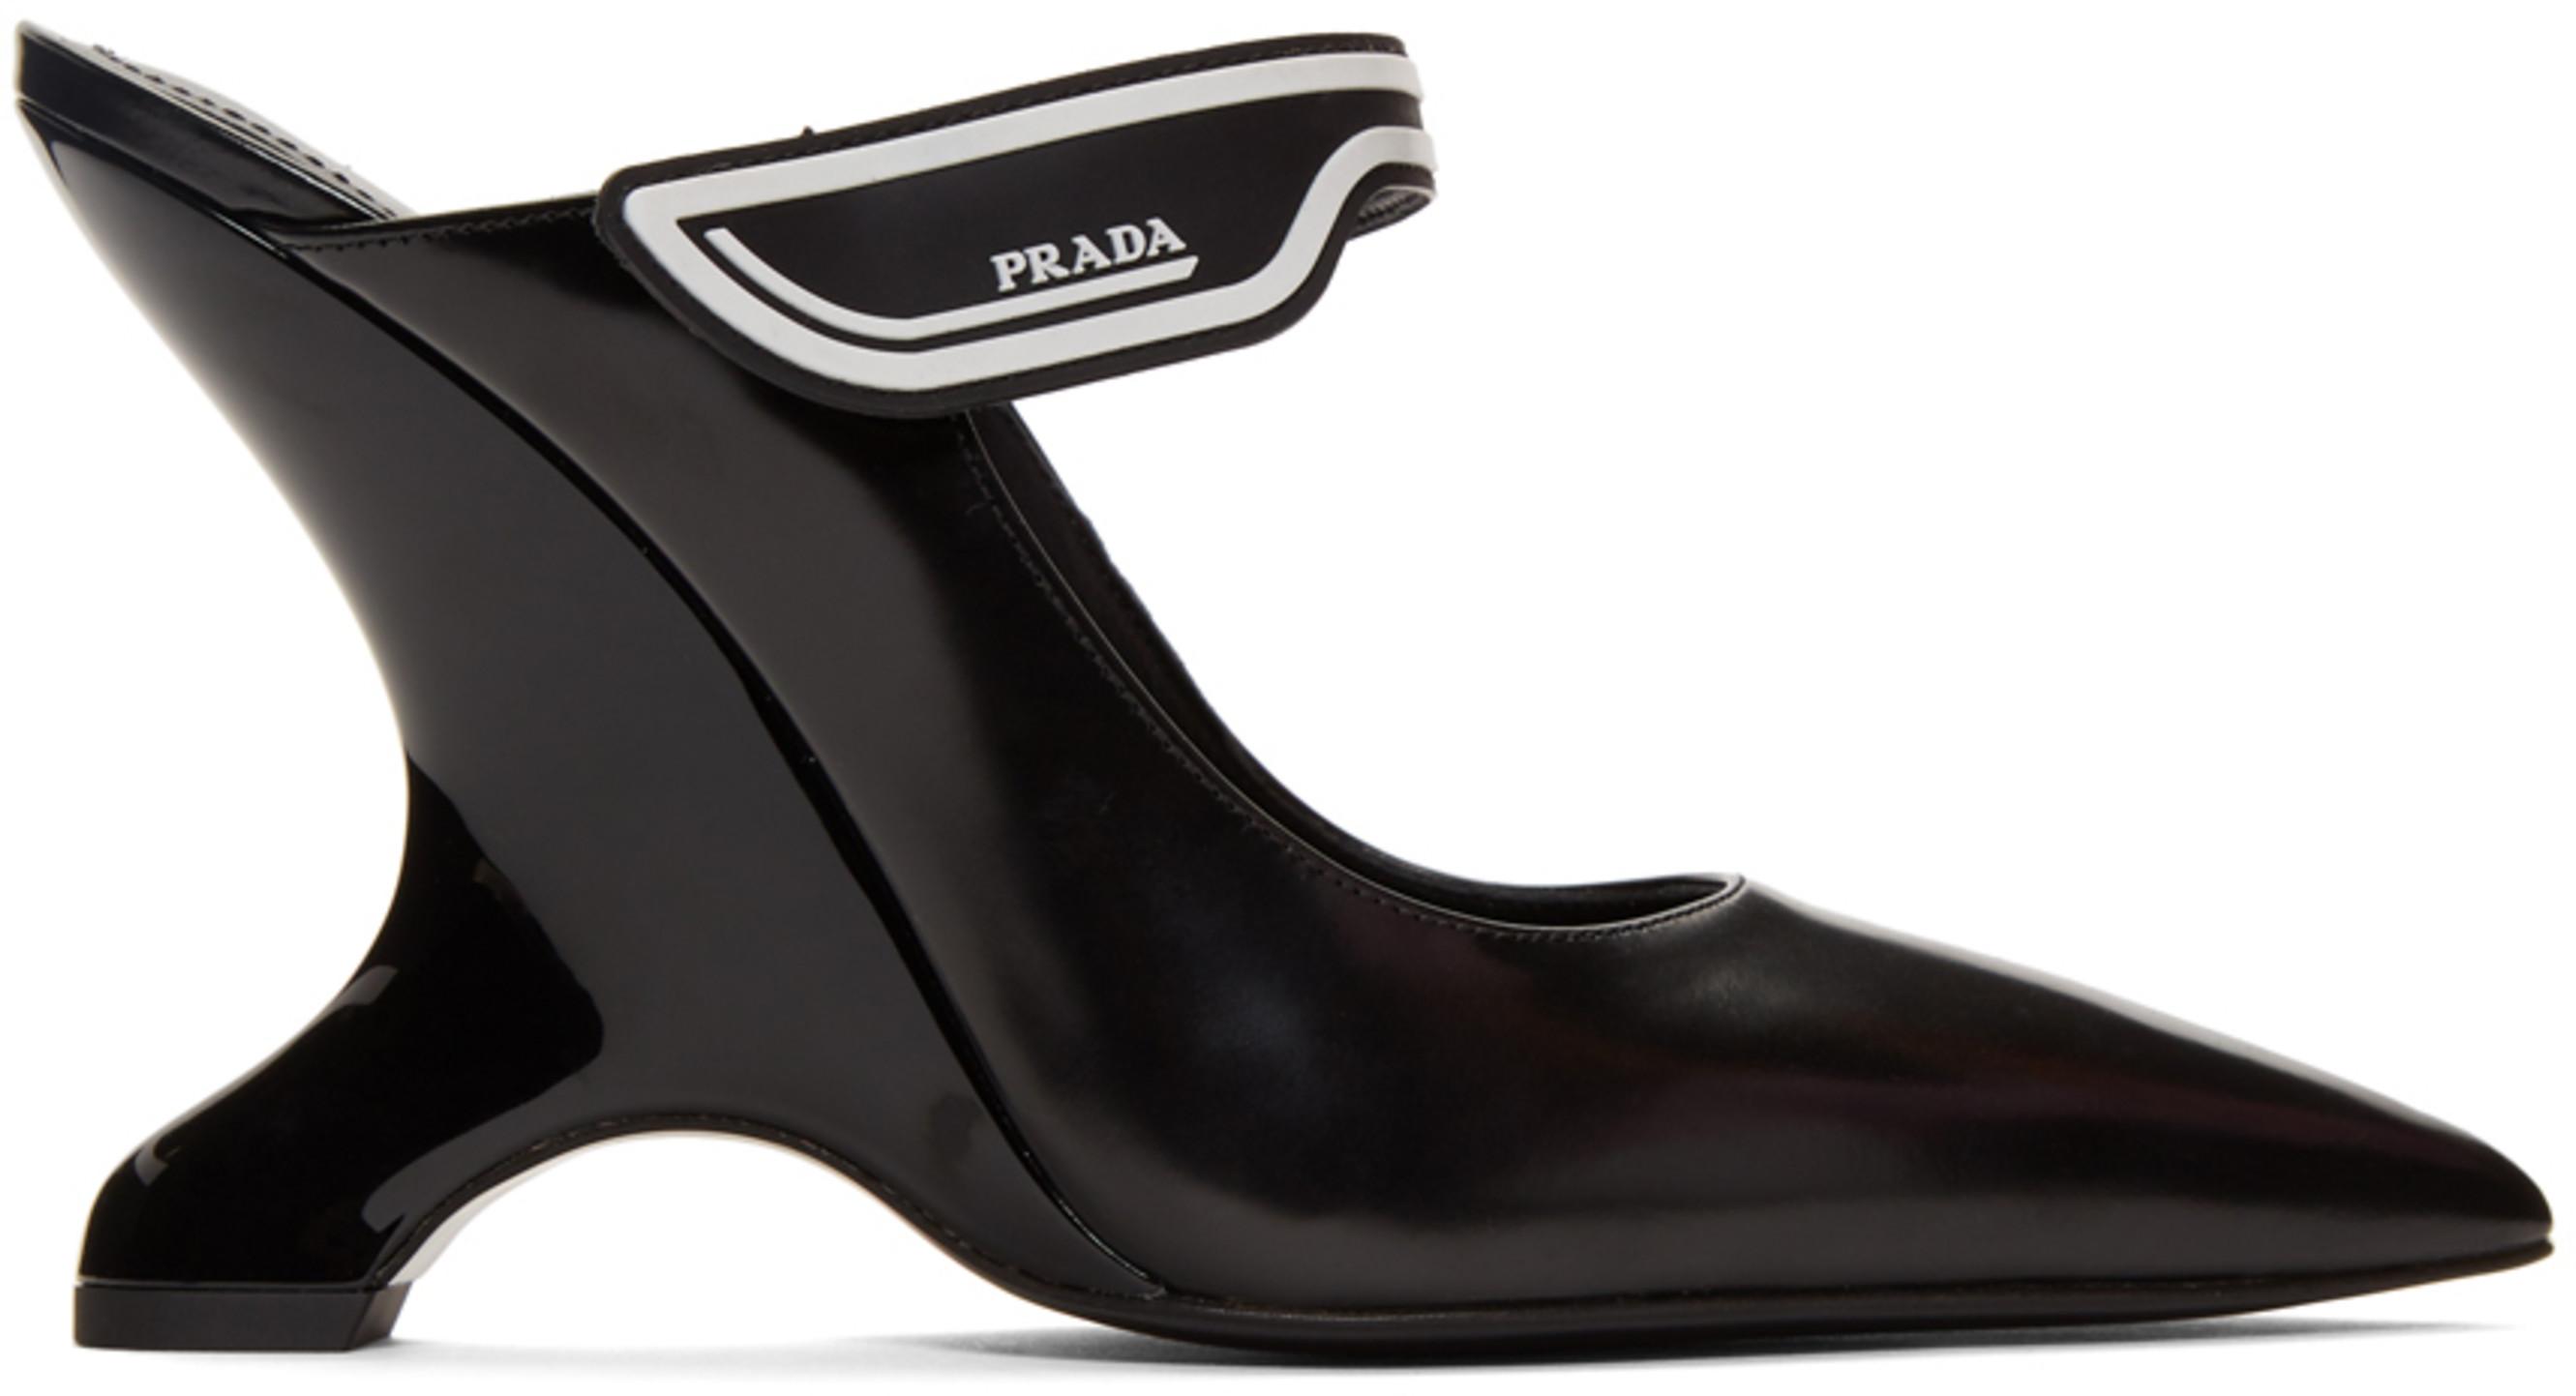 459f452c99b0 Prada shoes for Women